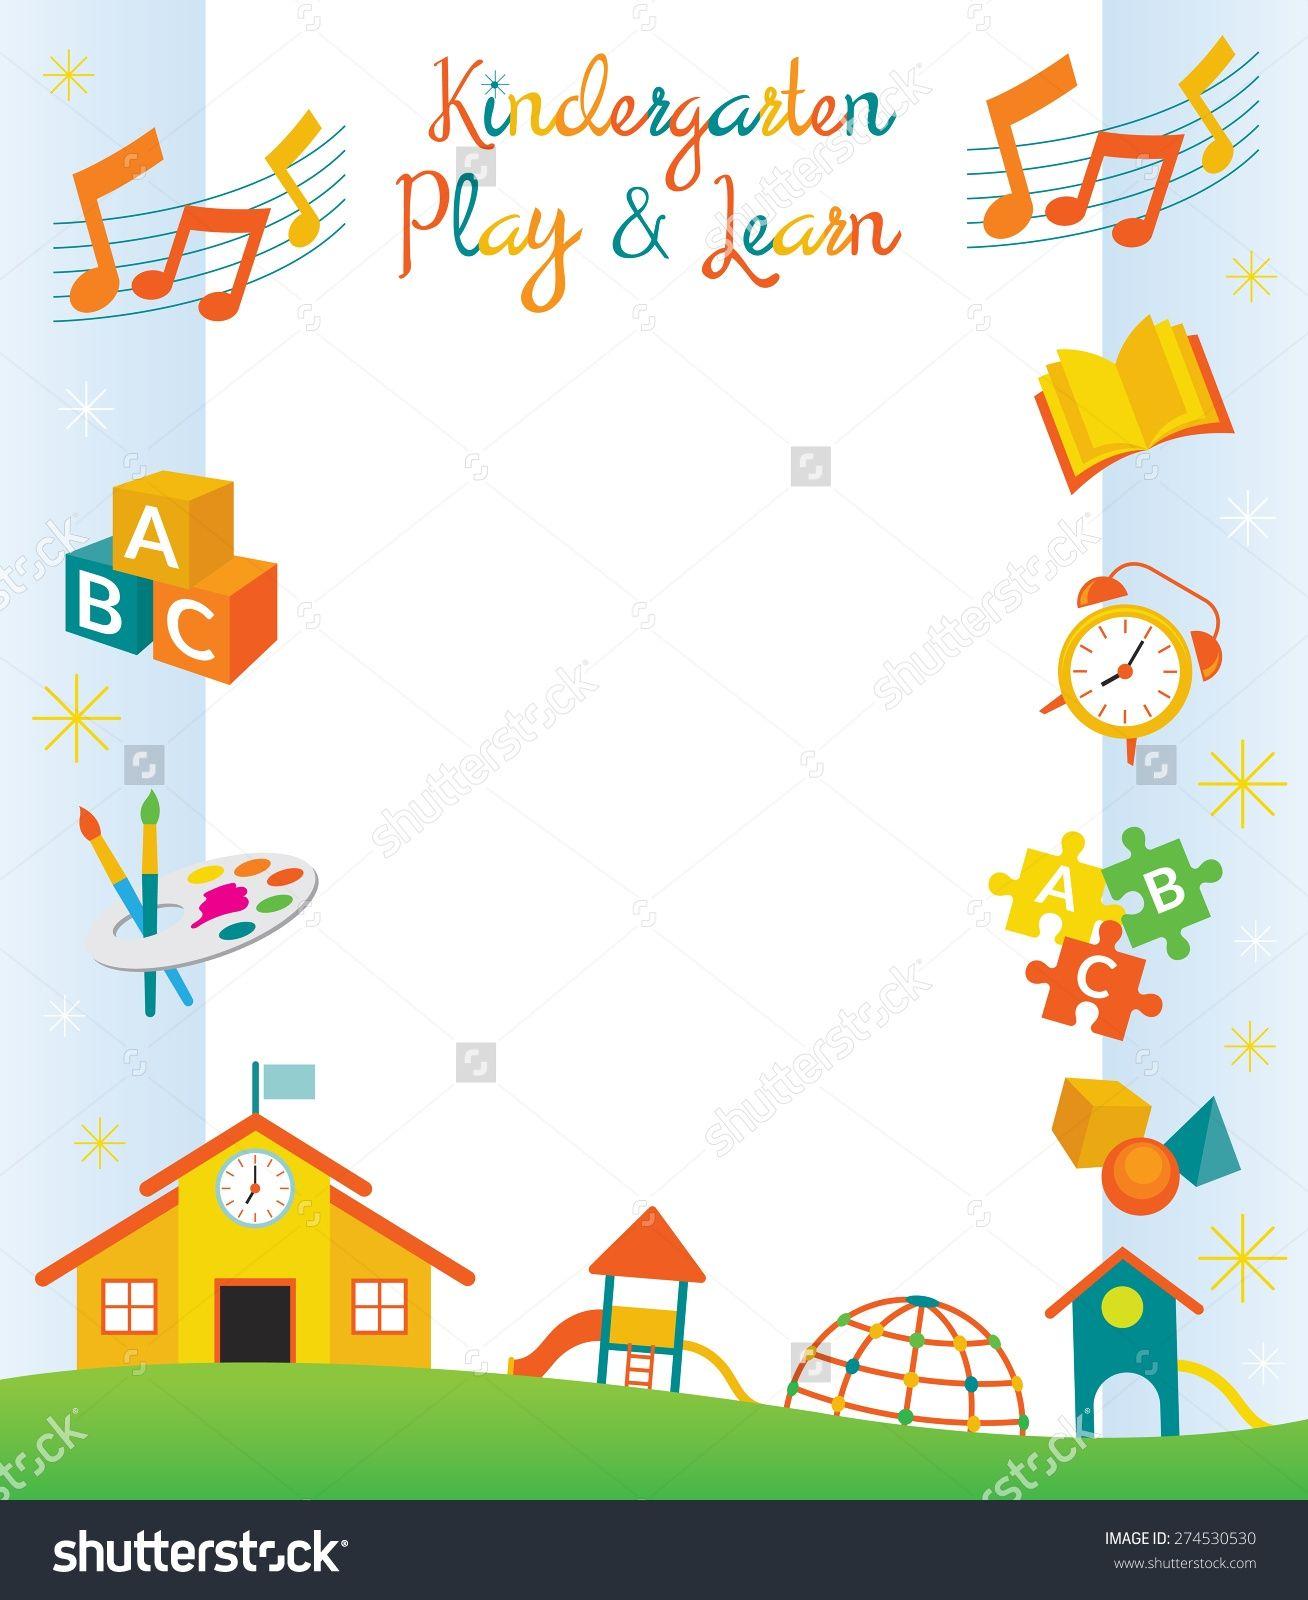 Kindergarten Preschool Kids Objects Border And Frame Education